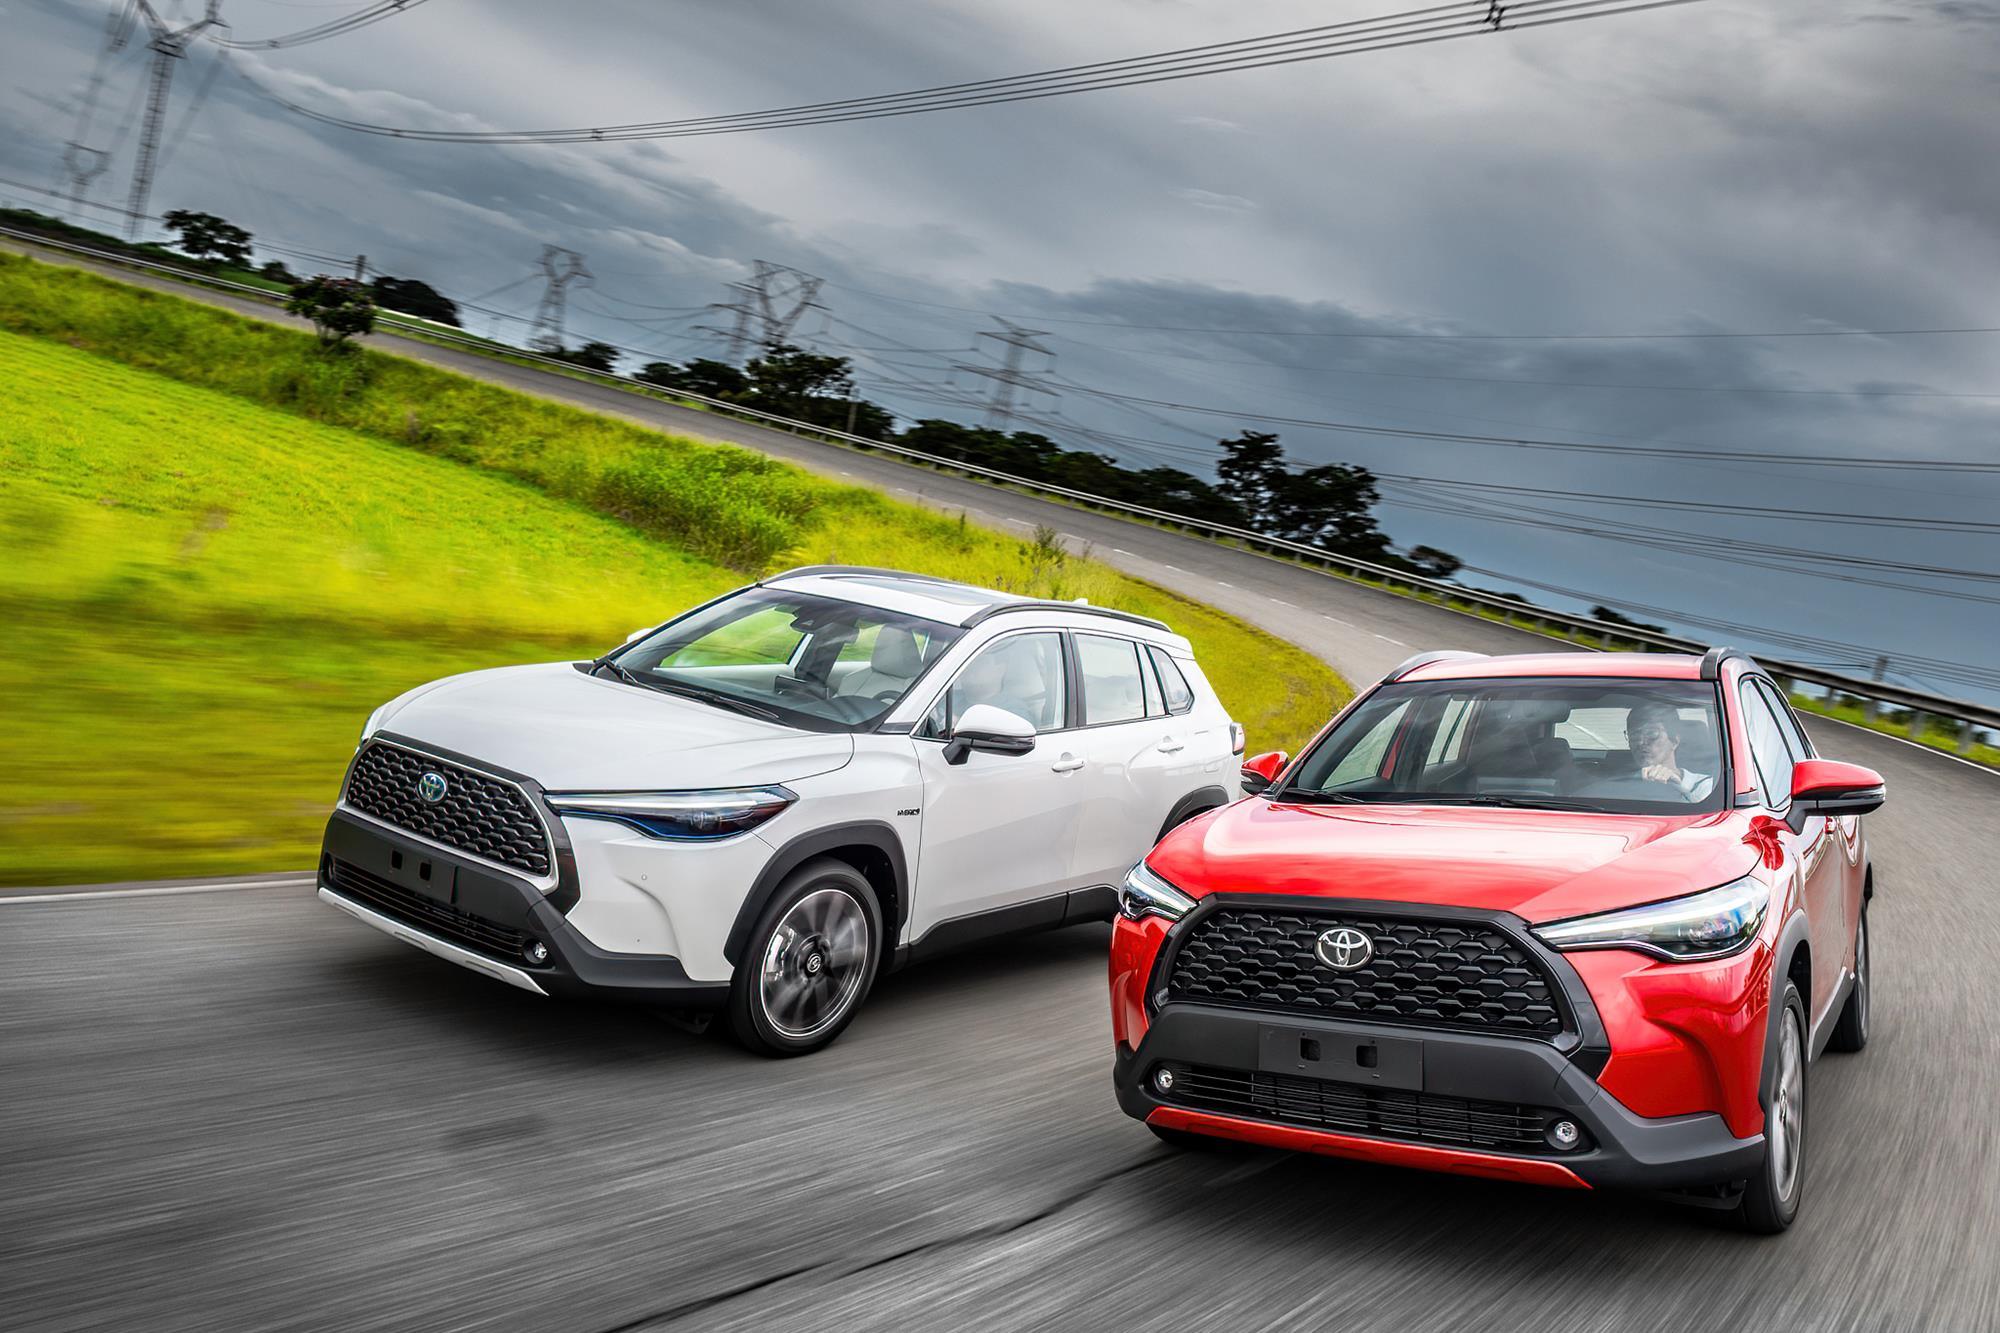 Toyota Corolla Cross XRE 2.0 2022